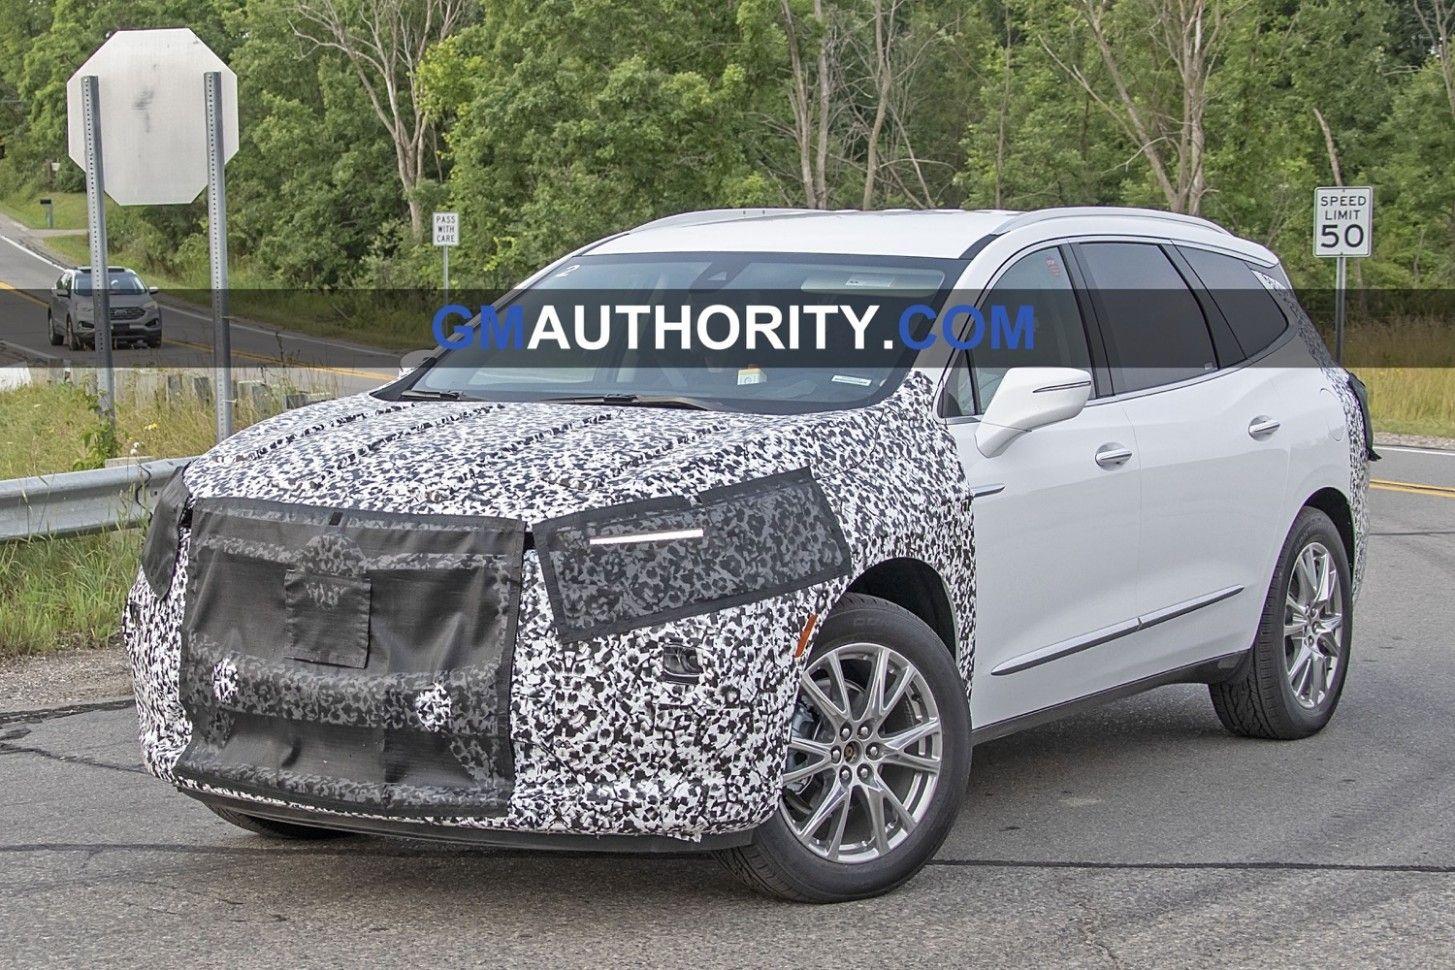 2021 Buick Enclave Spy Photos Concept